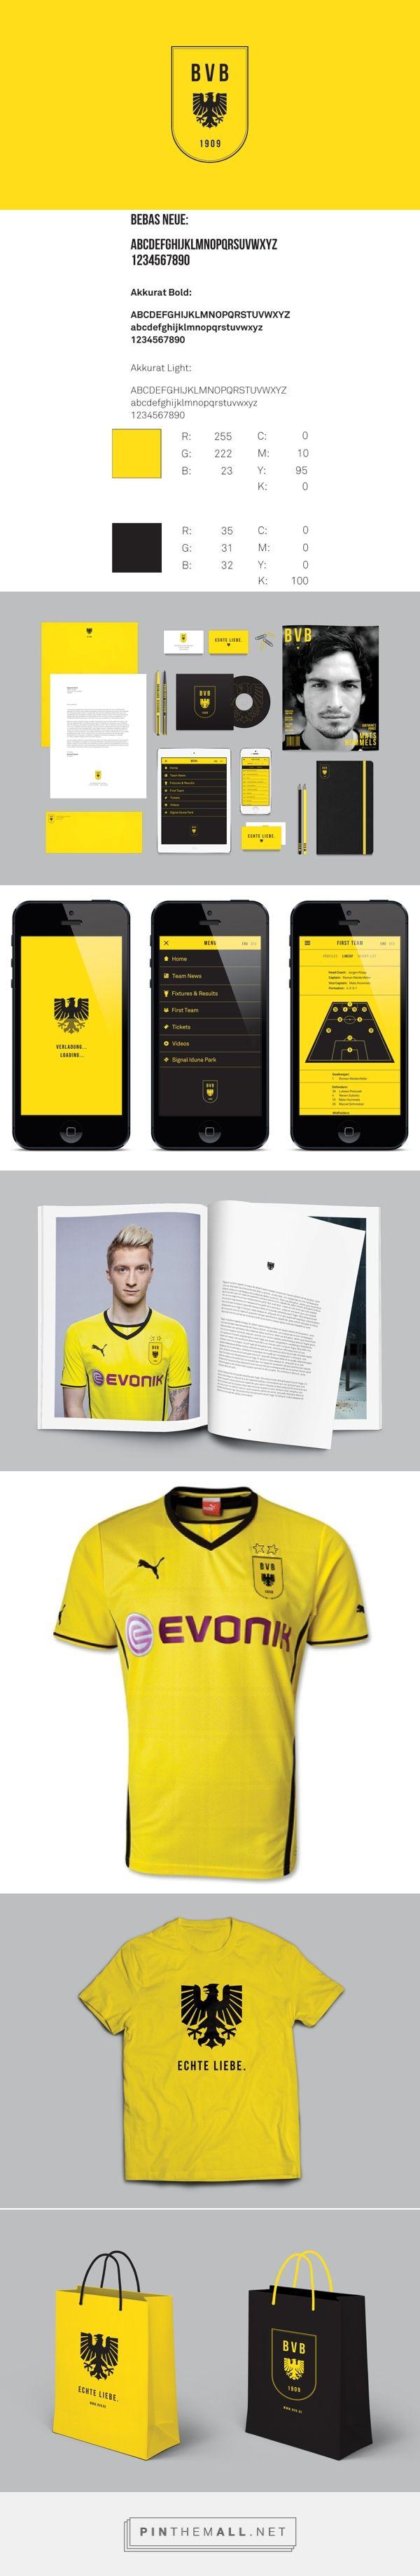 identity / Borussia Dortmund Rebrand on Branding Served - created via http://pinthemall.net